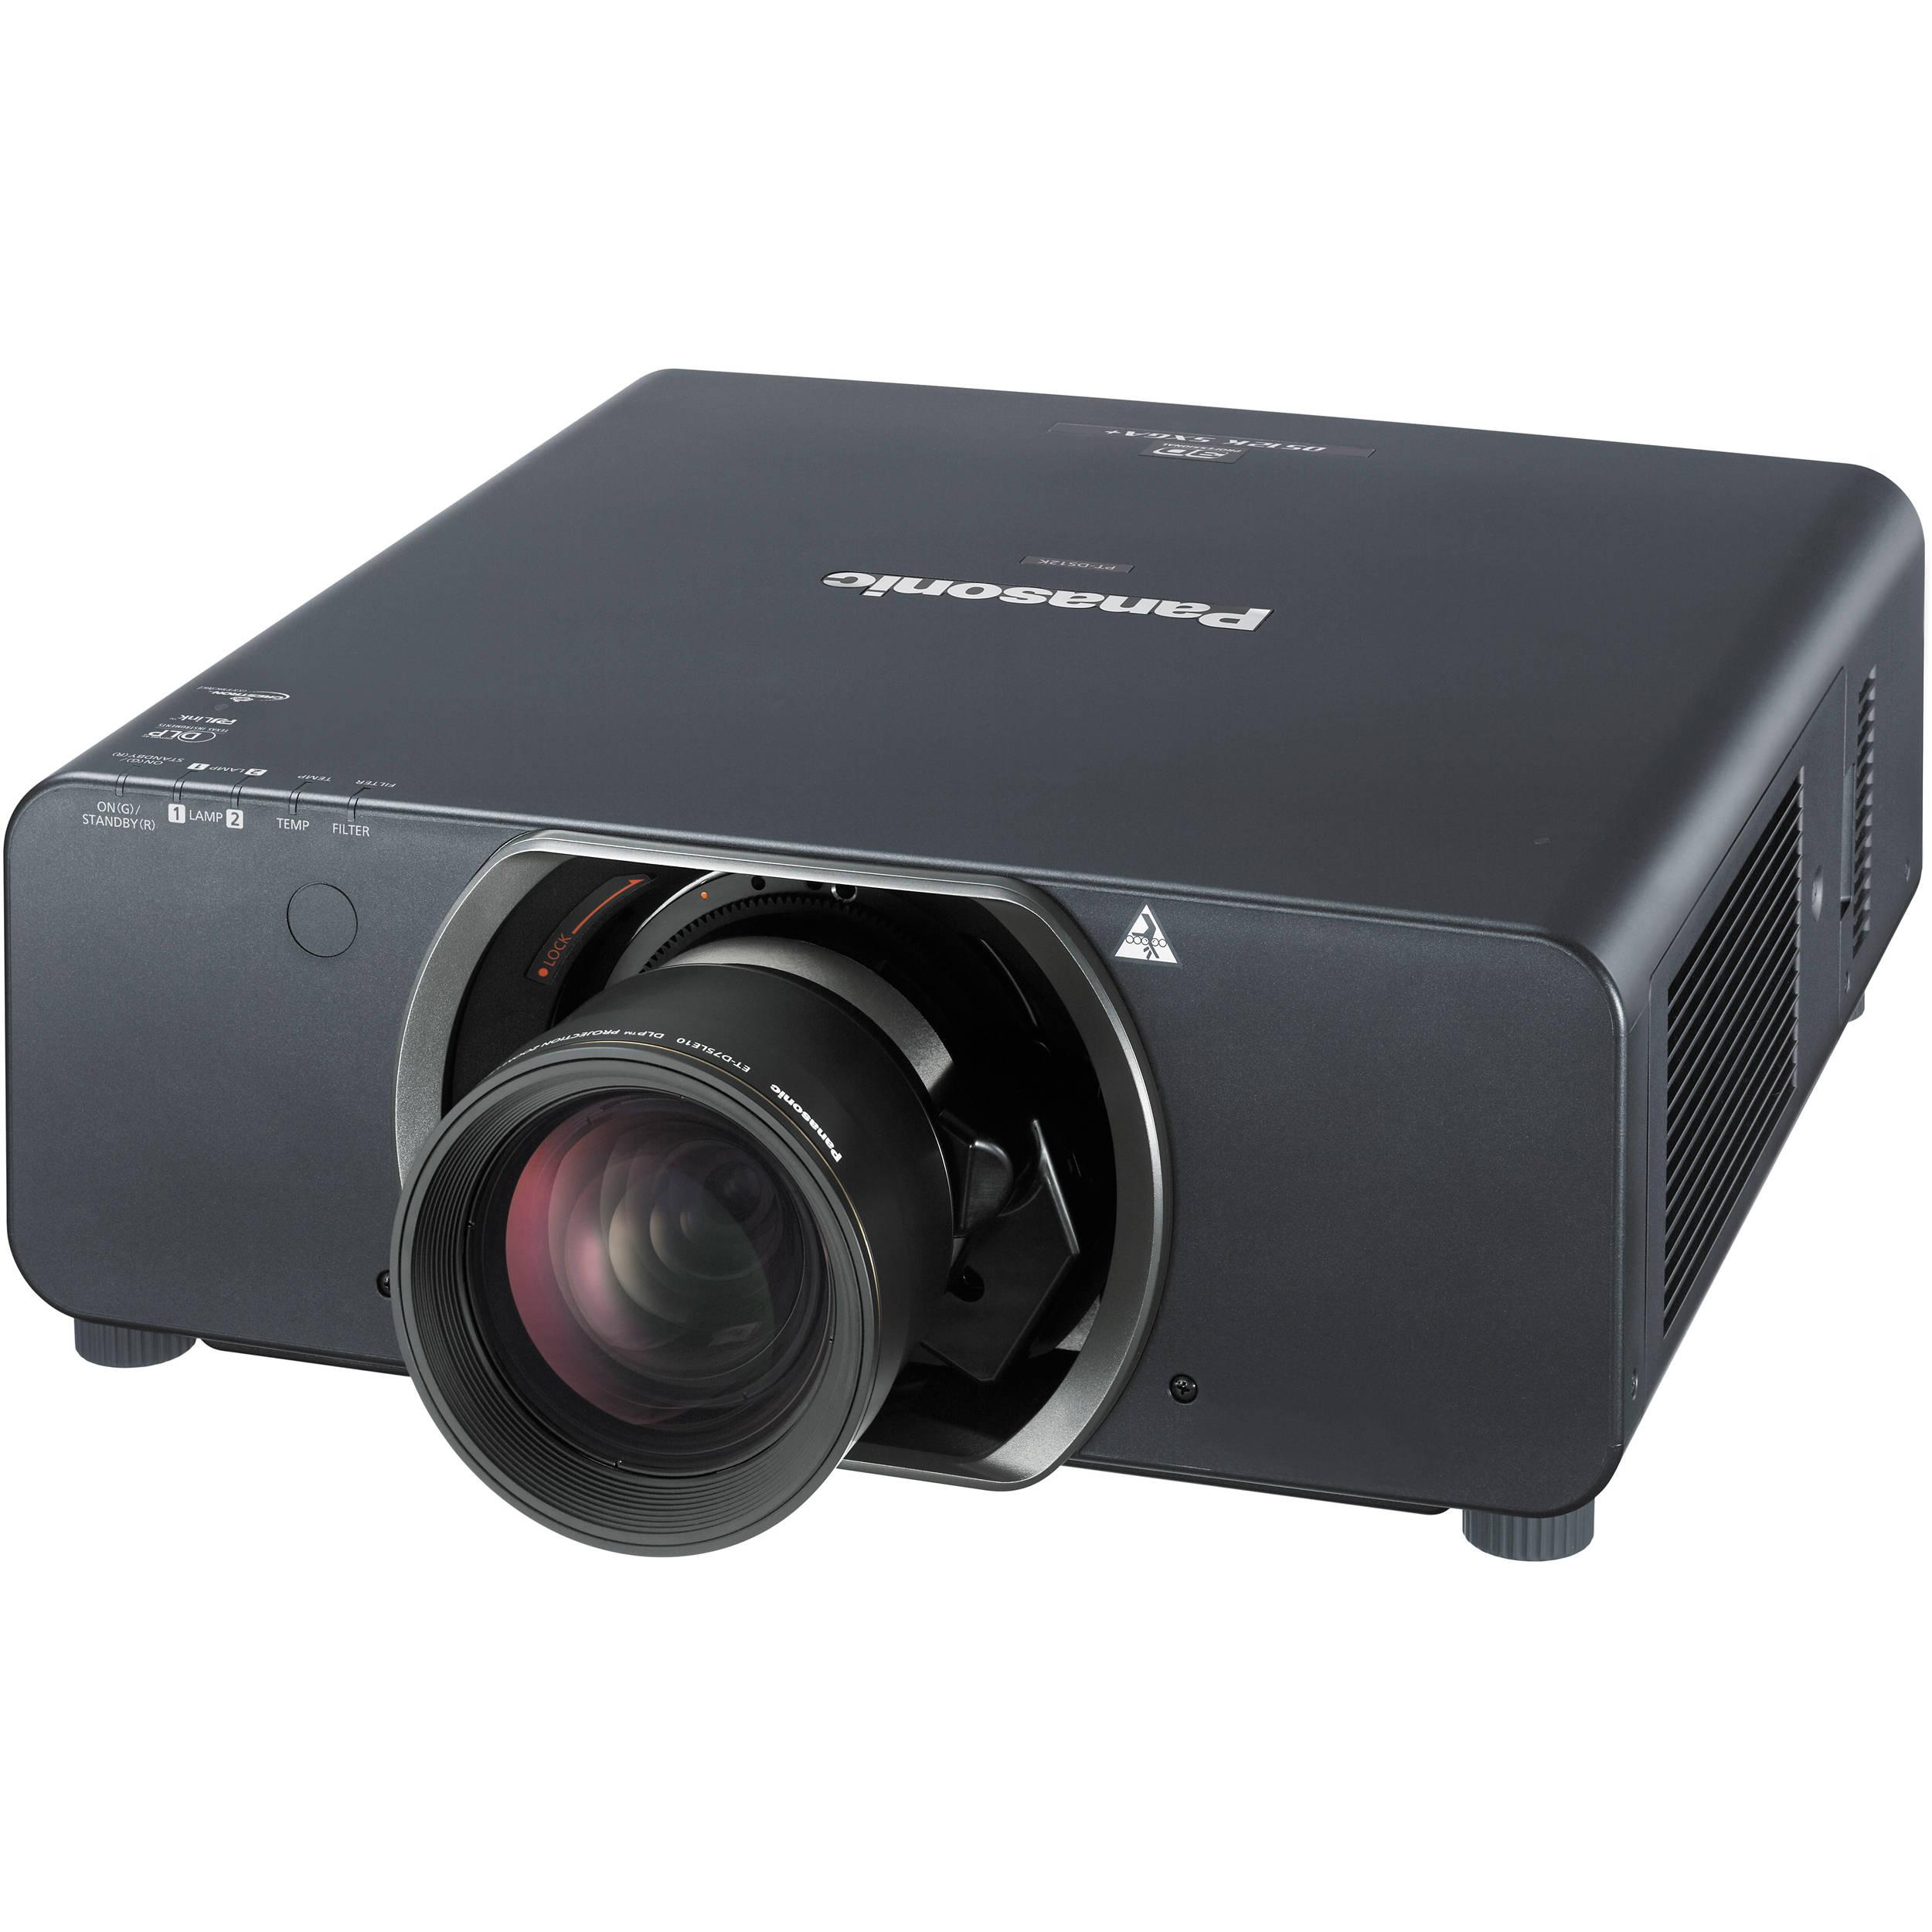 Panasonic PT-DS12KU 3-Chip DLP Projector PT-DS12KU B&H Photo